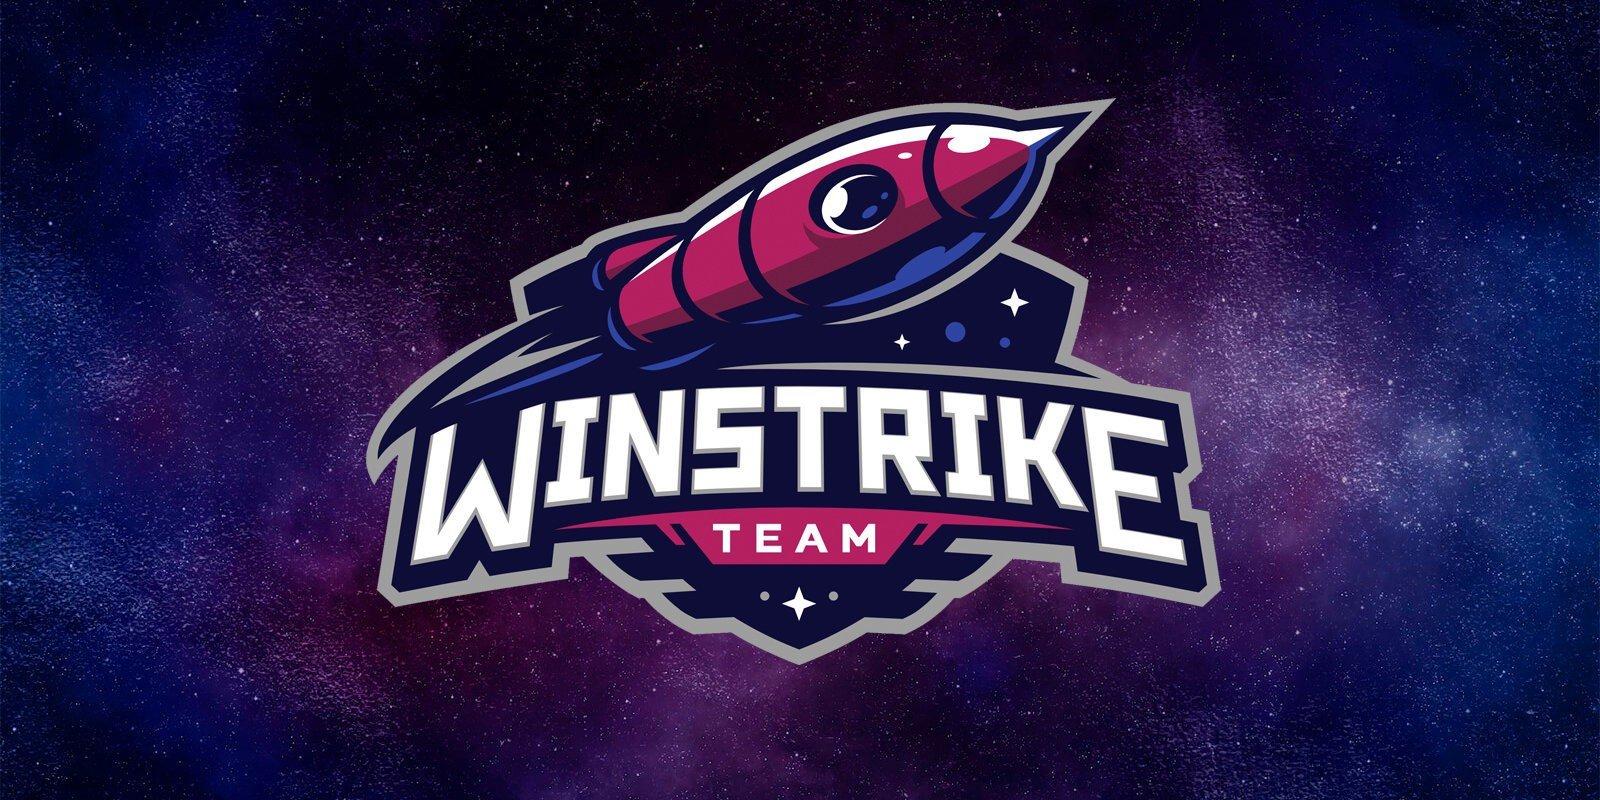 Winstrike распустила состав и ушла из Rainbow Six Siege